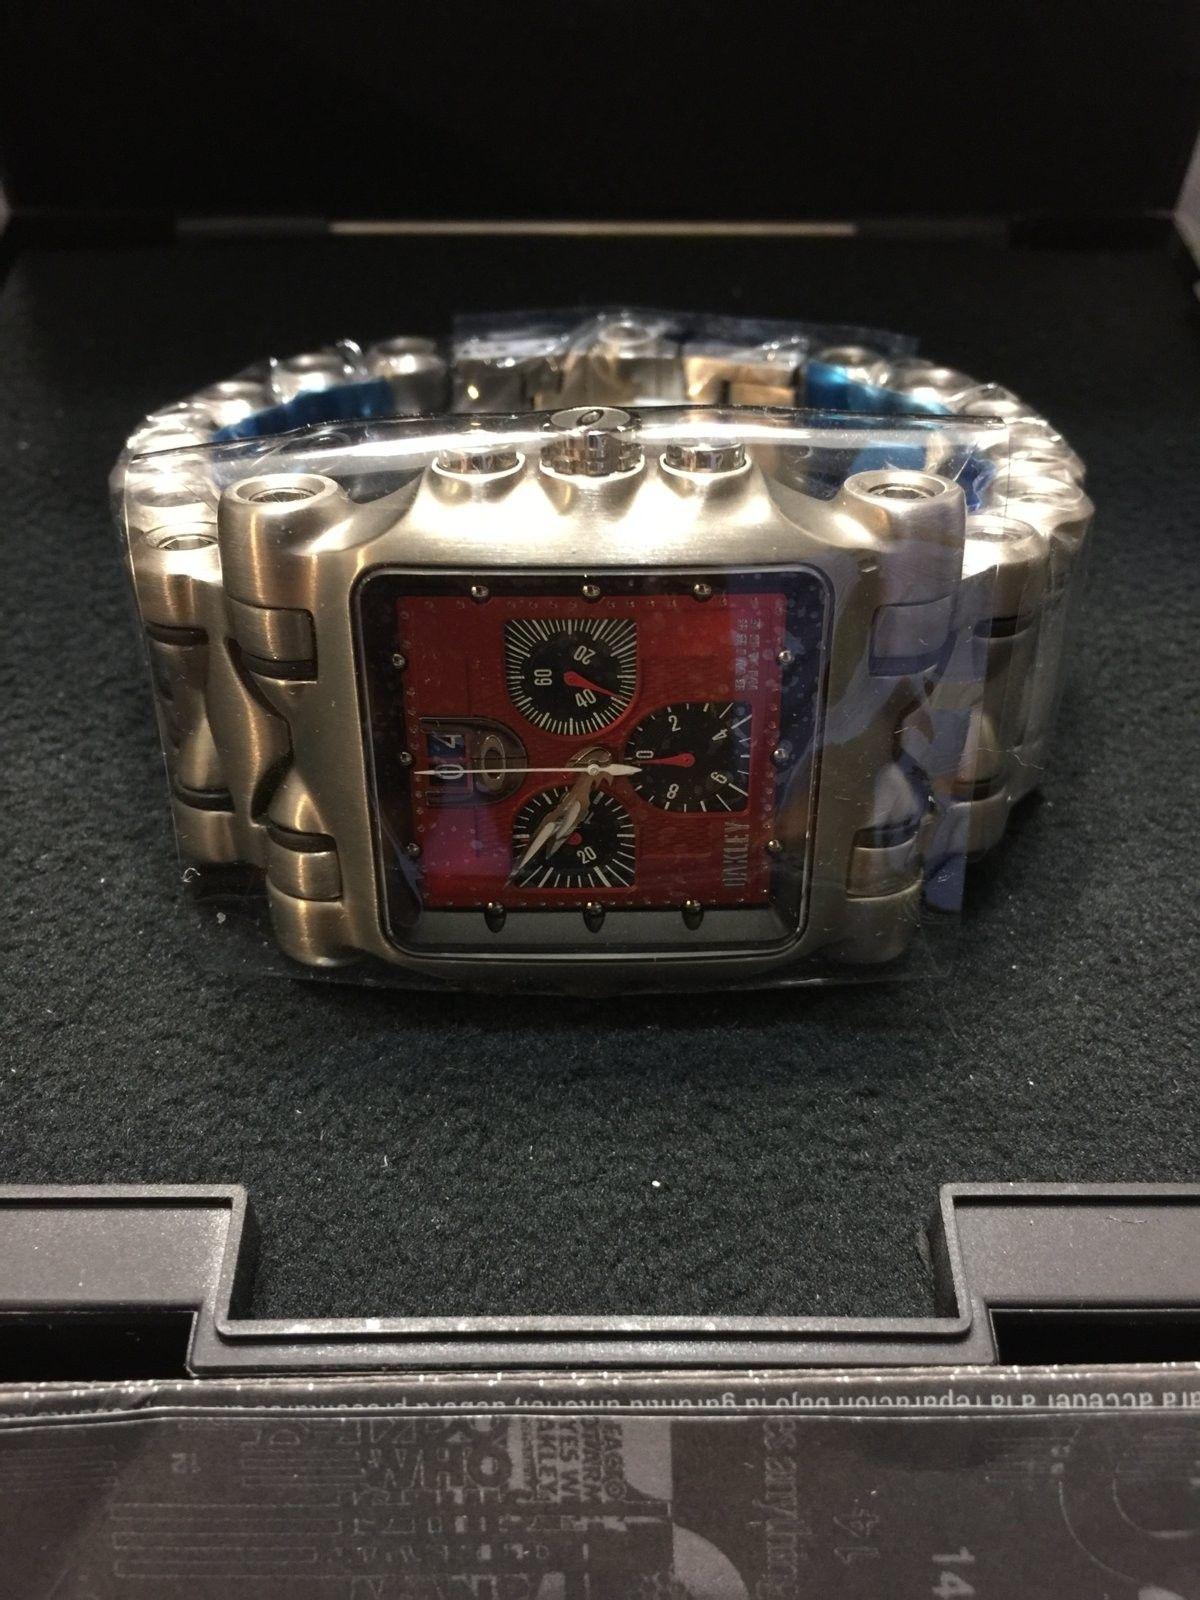 LNIB/BNIB Red Minute Machine - IMG_7752.JPG